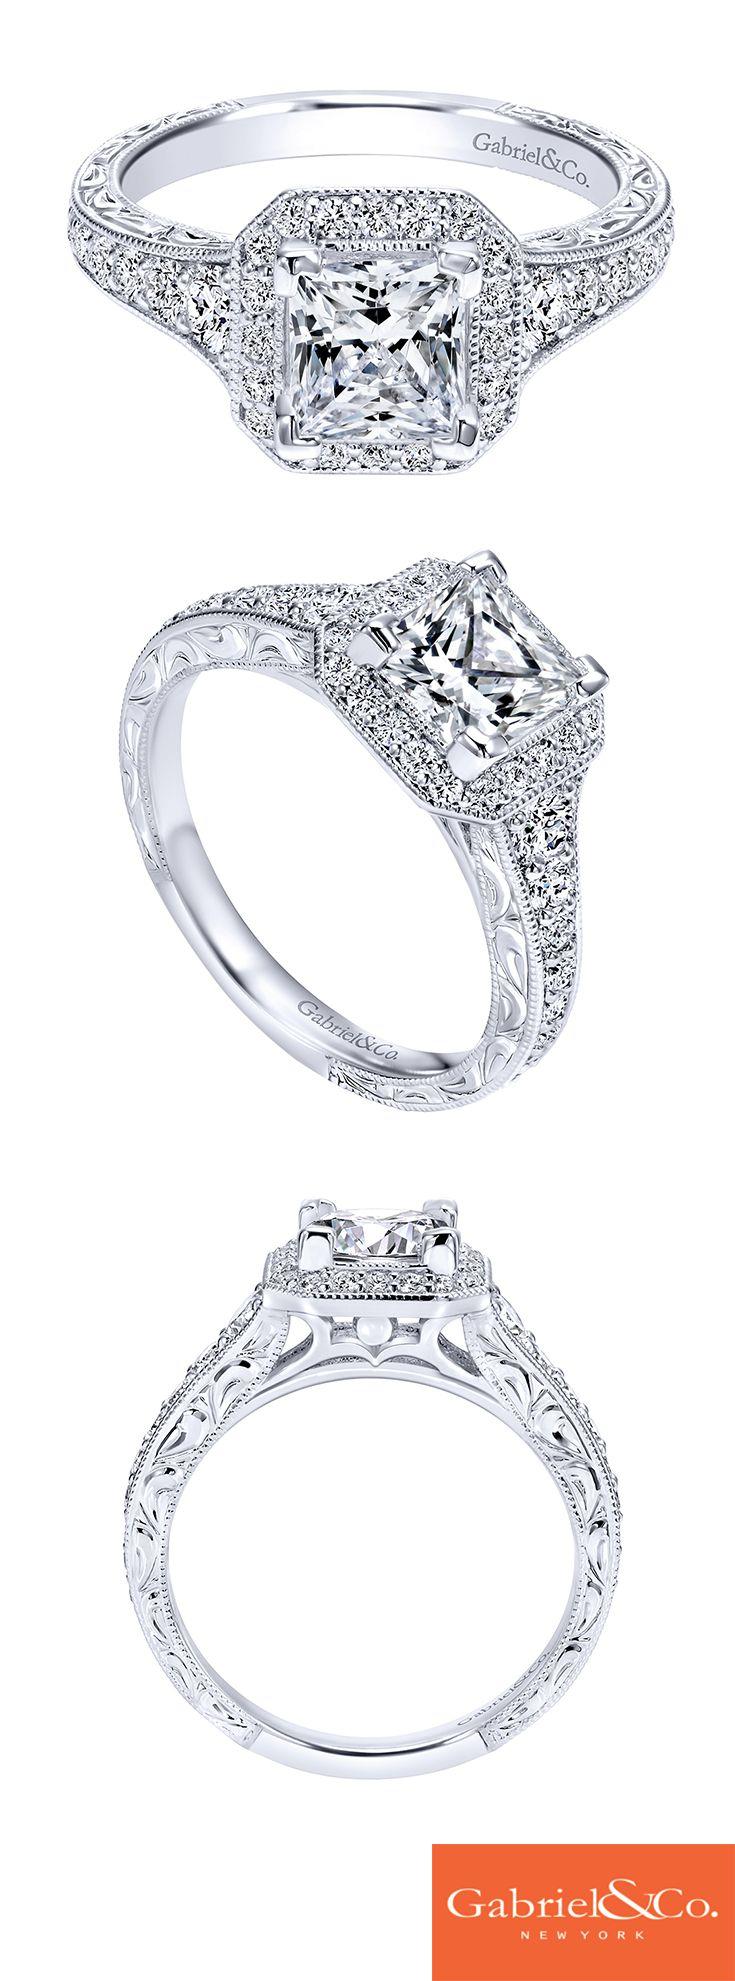 Vintage 14k White Gold Princess Cut Halo  Er11793s4w44jj Intricate  Engagement Ringdream